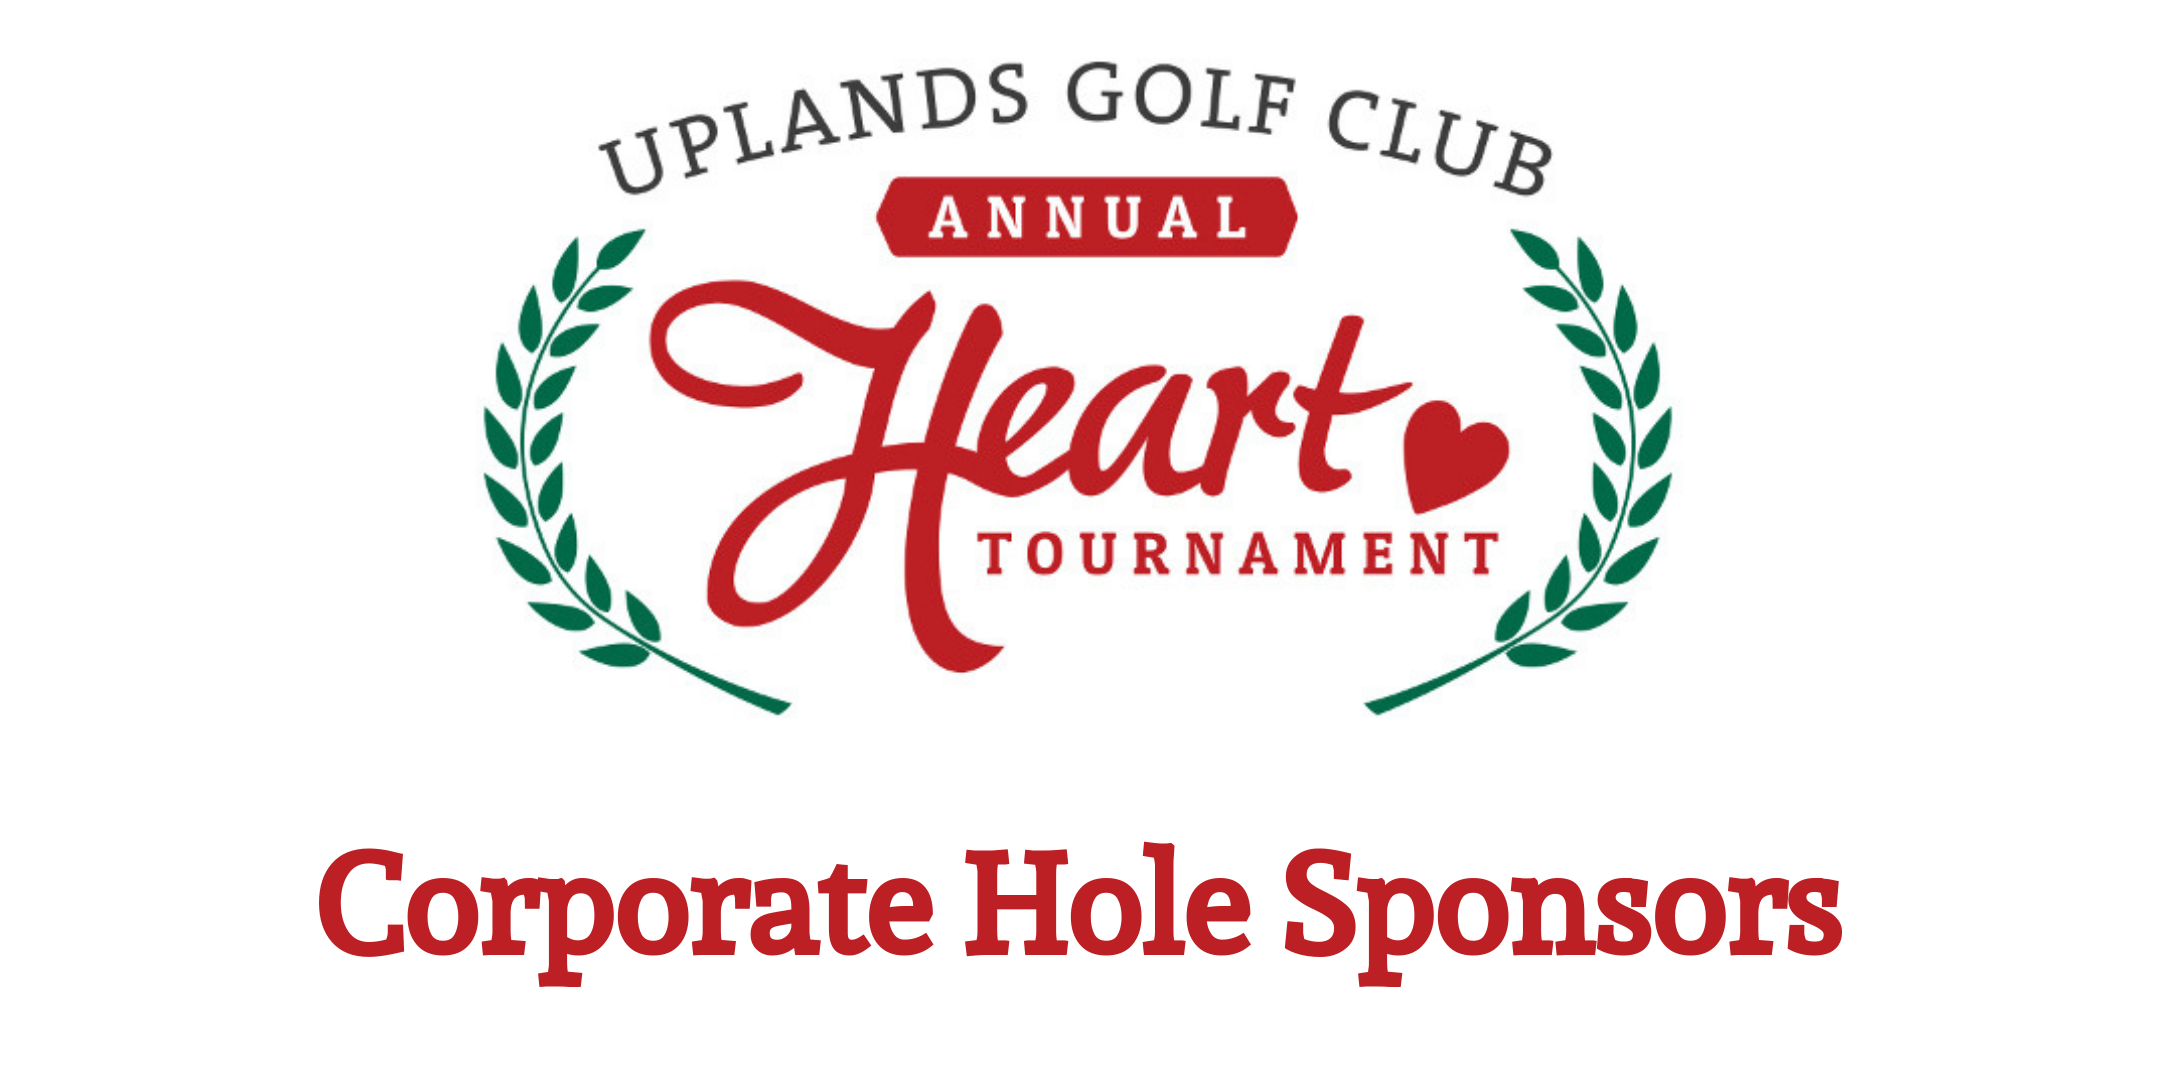 2020 Virtual Corporate Hole Sponsorships